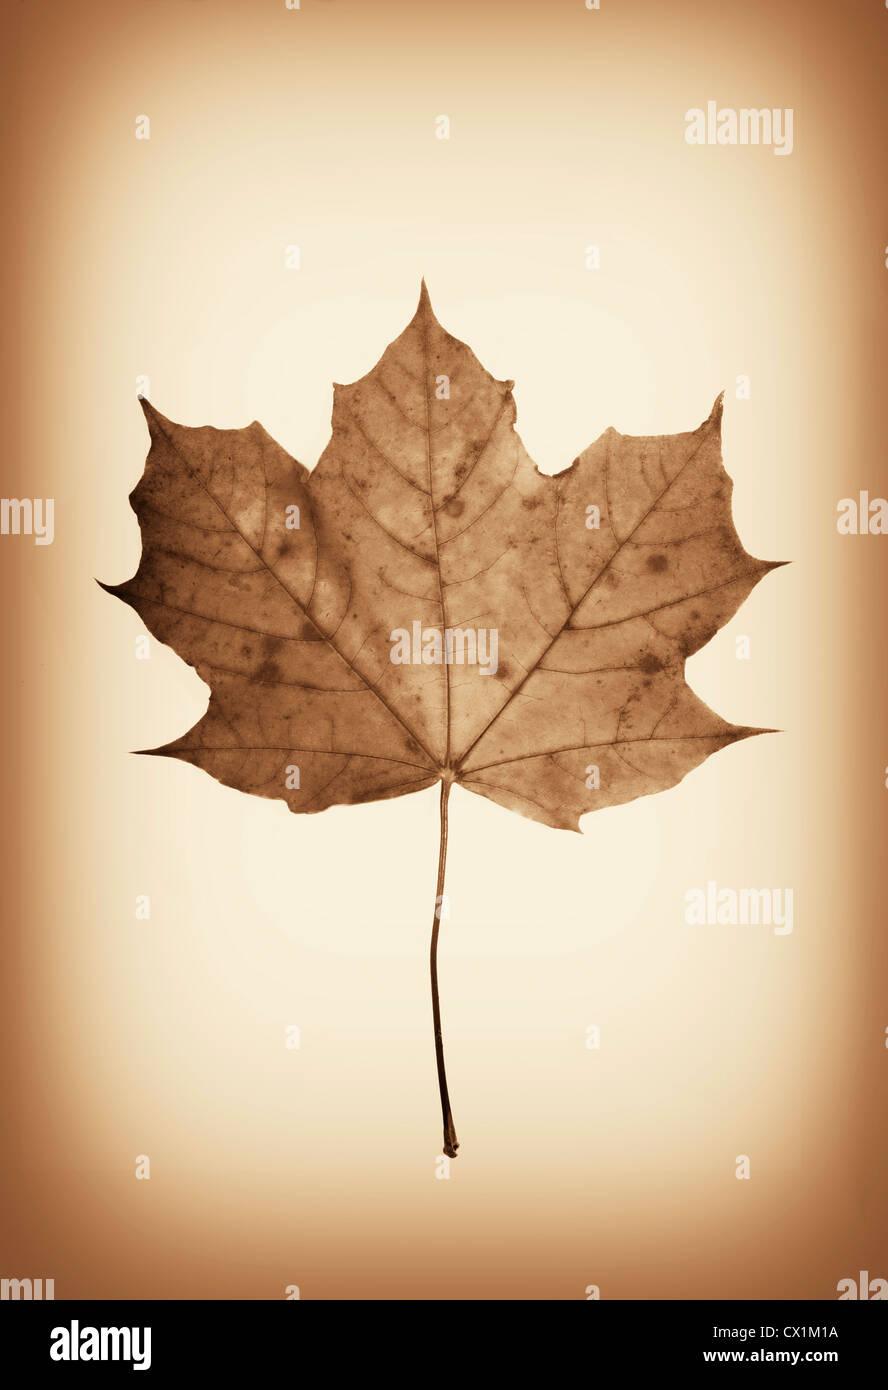 Antique sepia toned pressed maple leaf in a sepia tone. - Stock Image